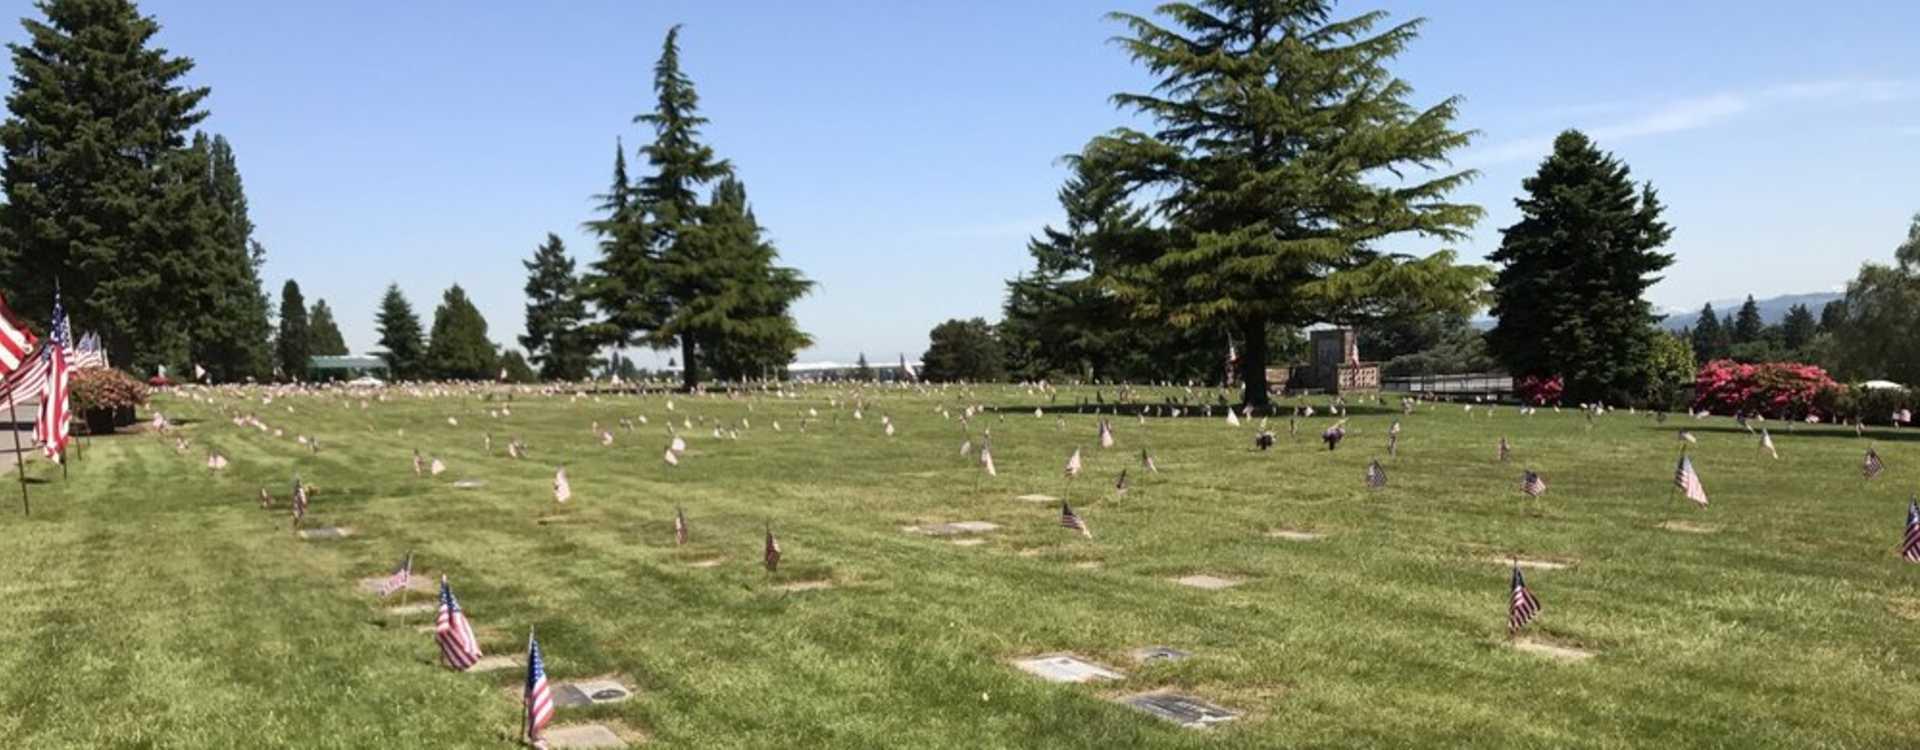 Washington Memorial Park & Mortuary, Inc.